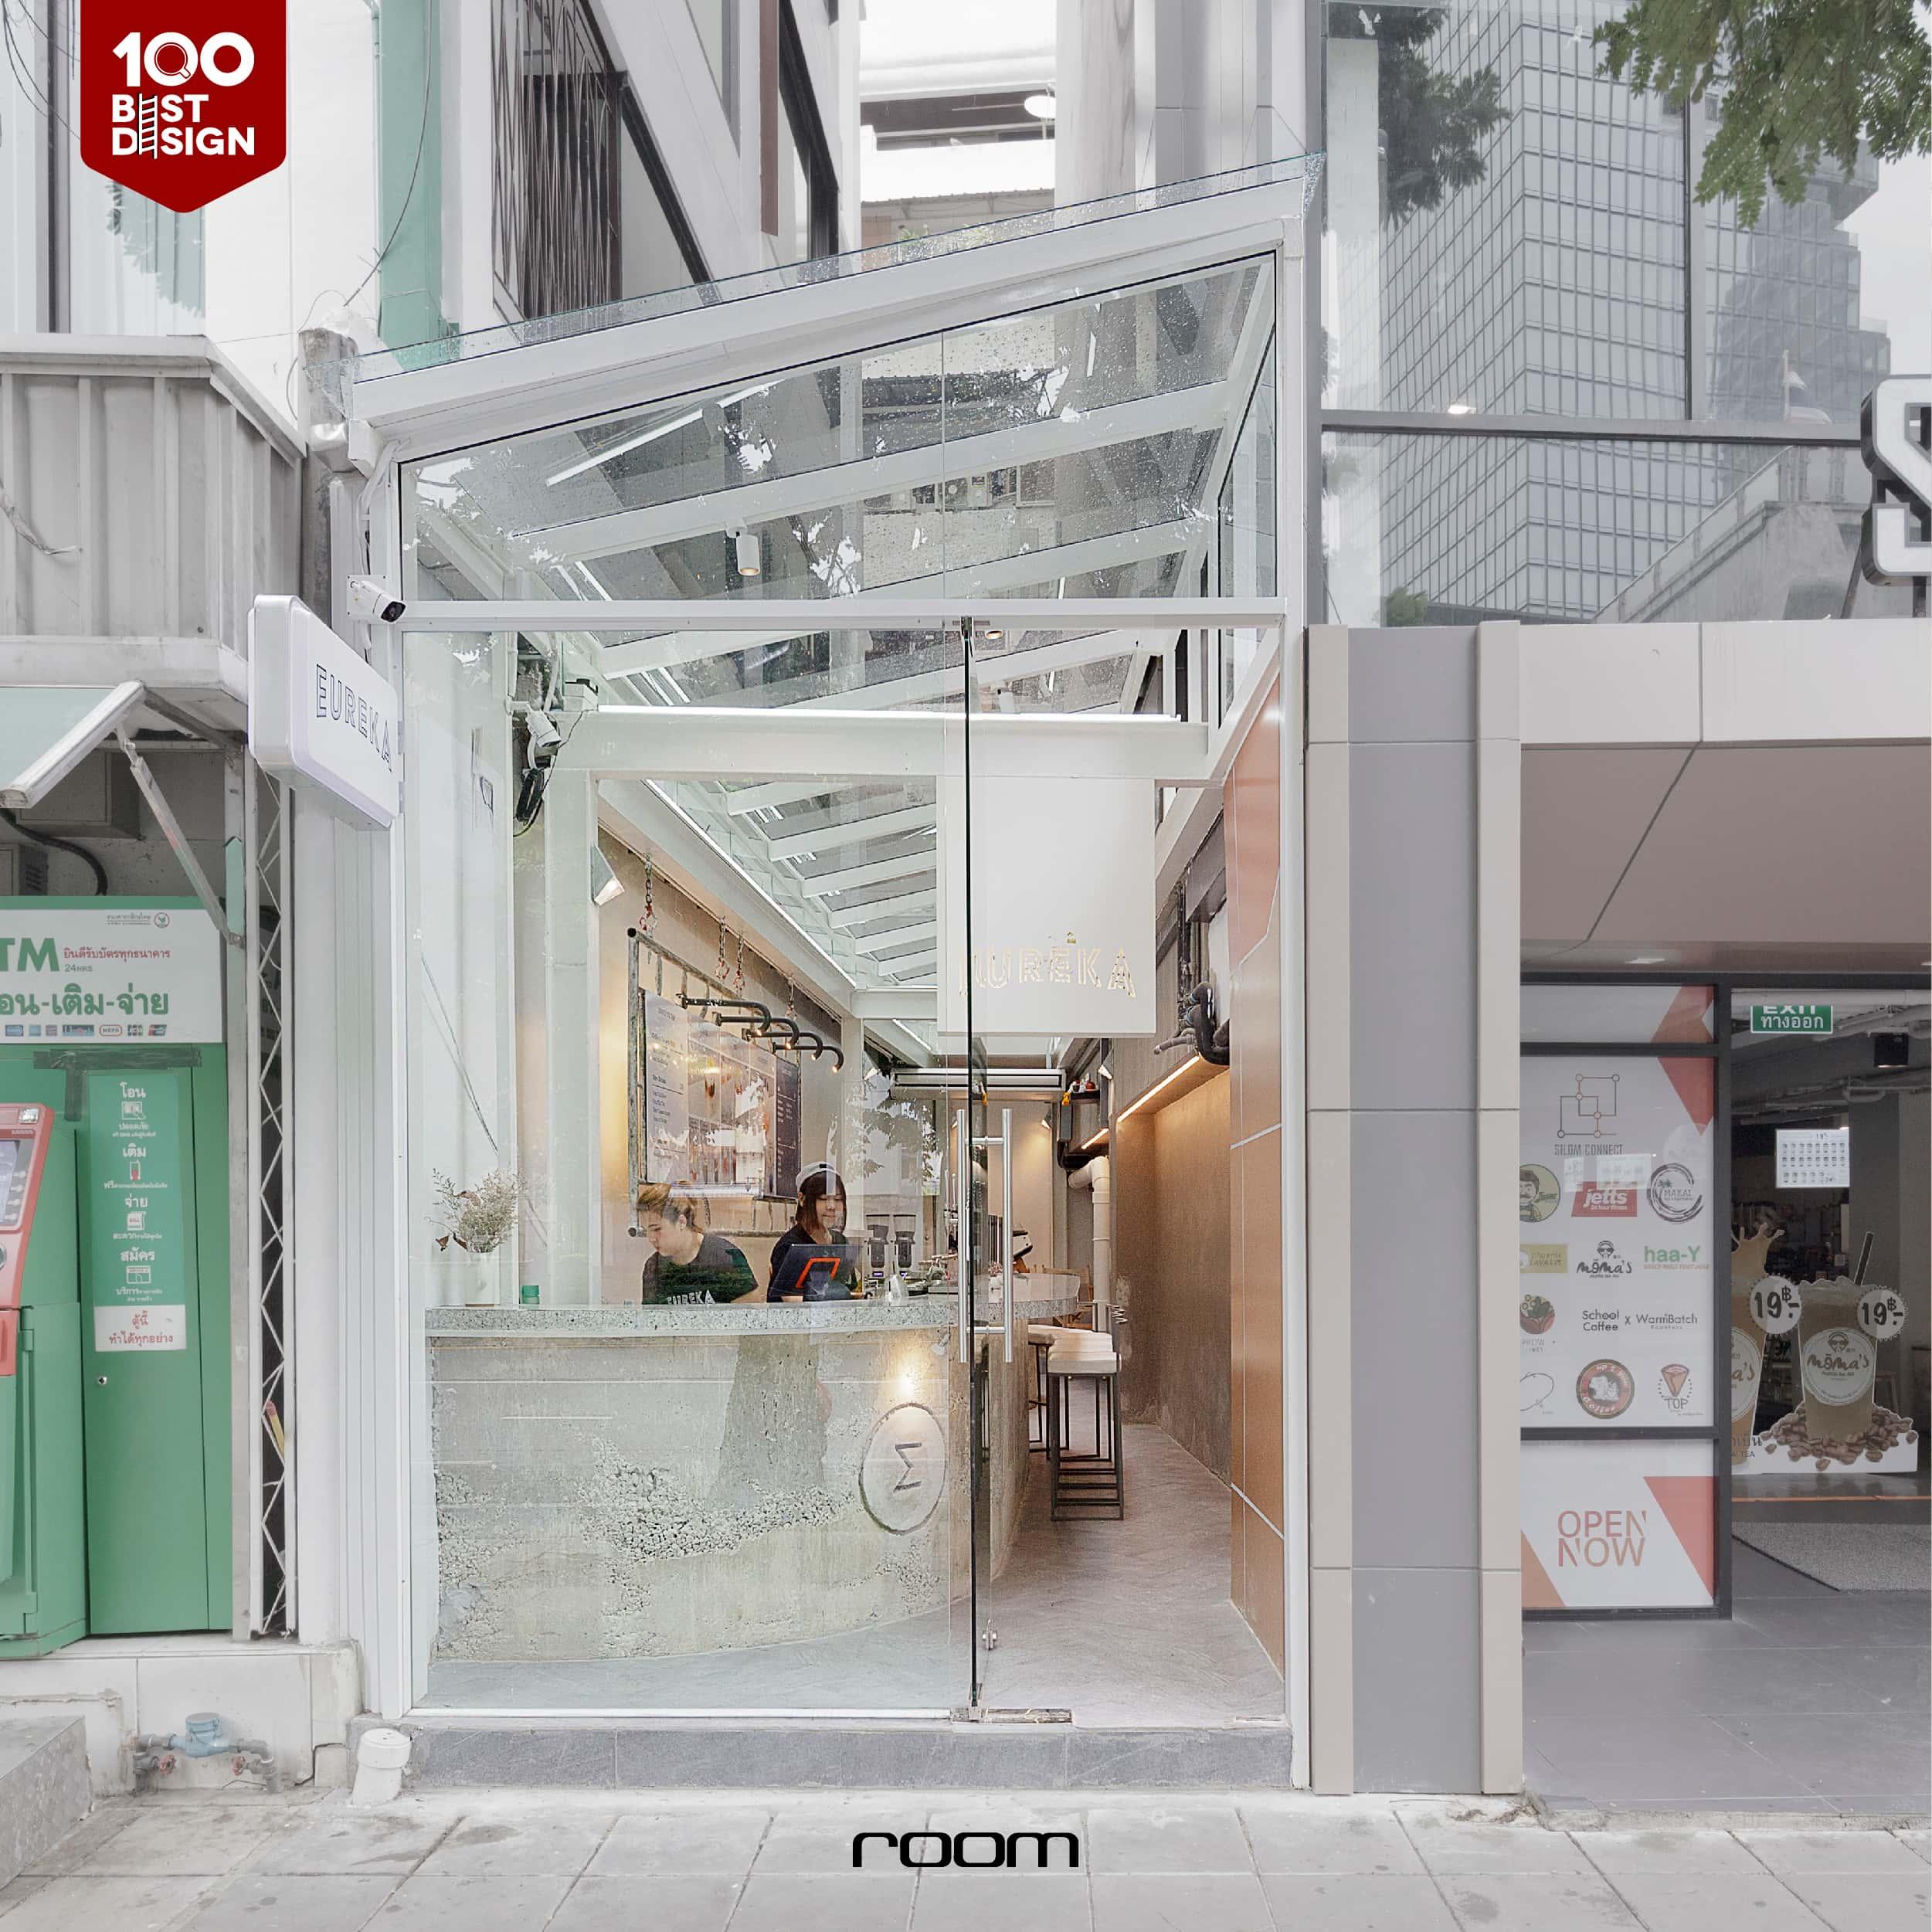 Small space cafe inspiration - Eureka Cafe Bangkok Thailand